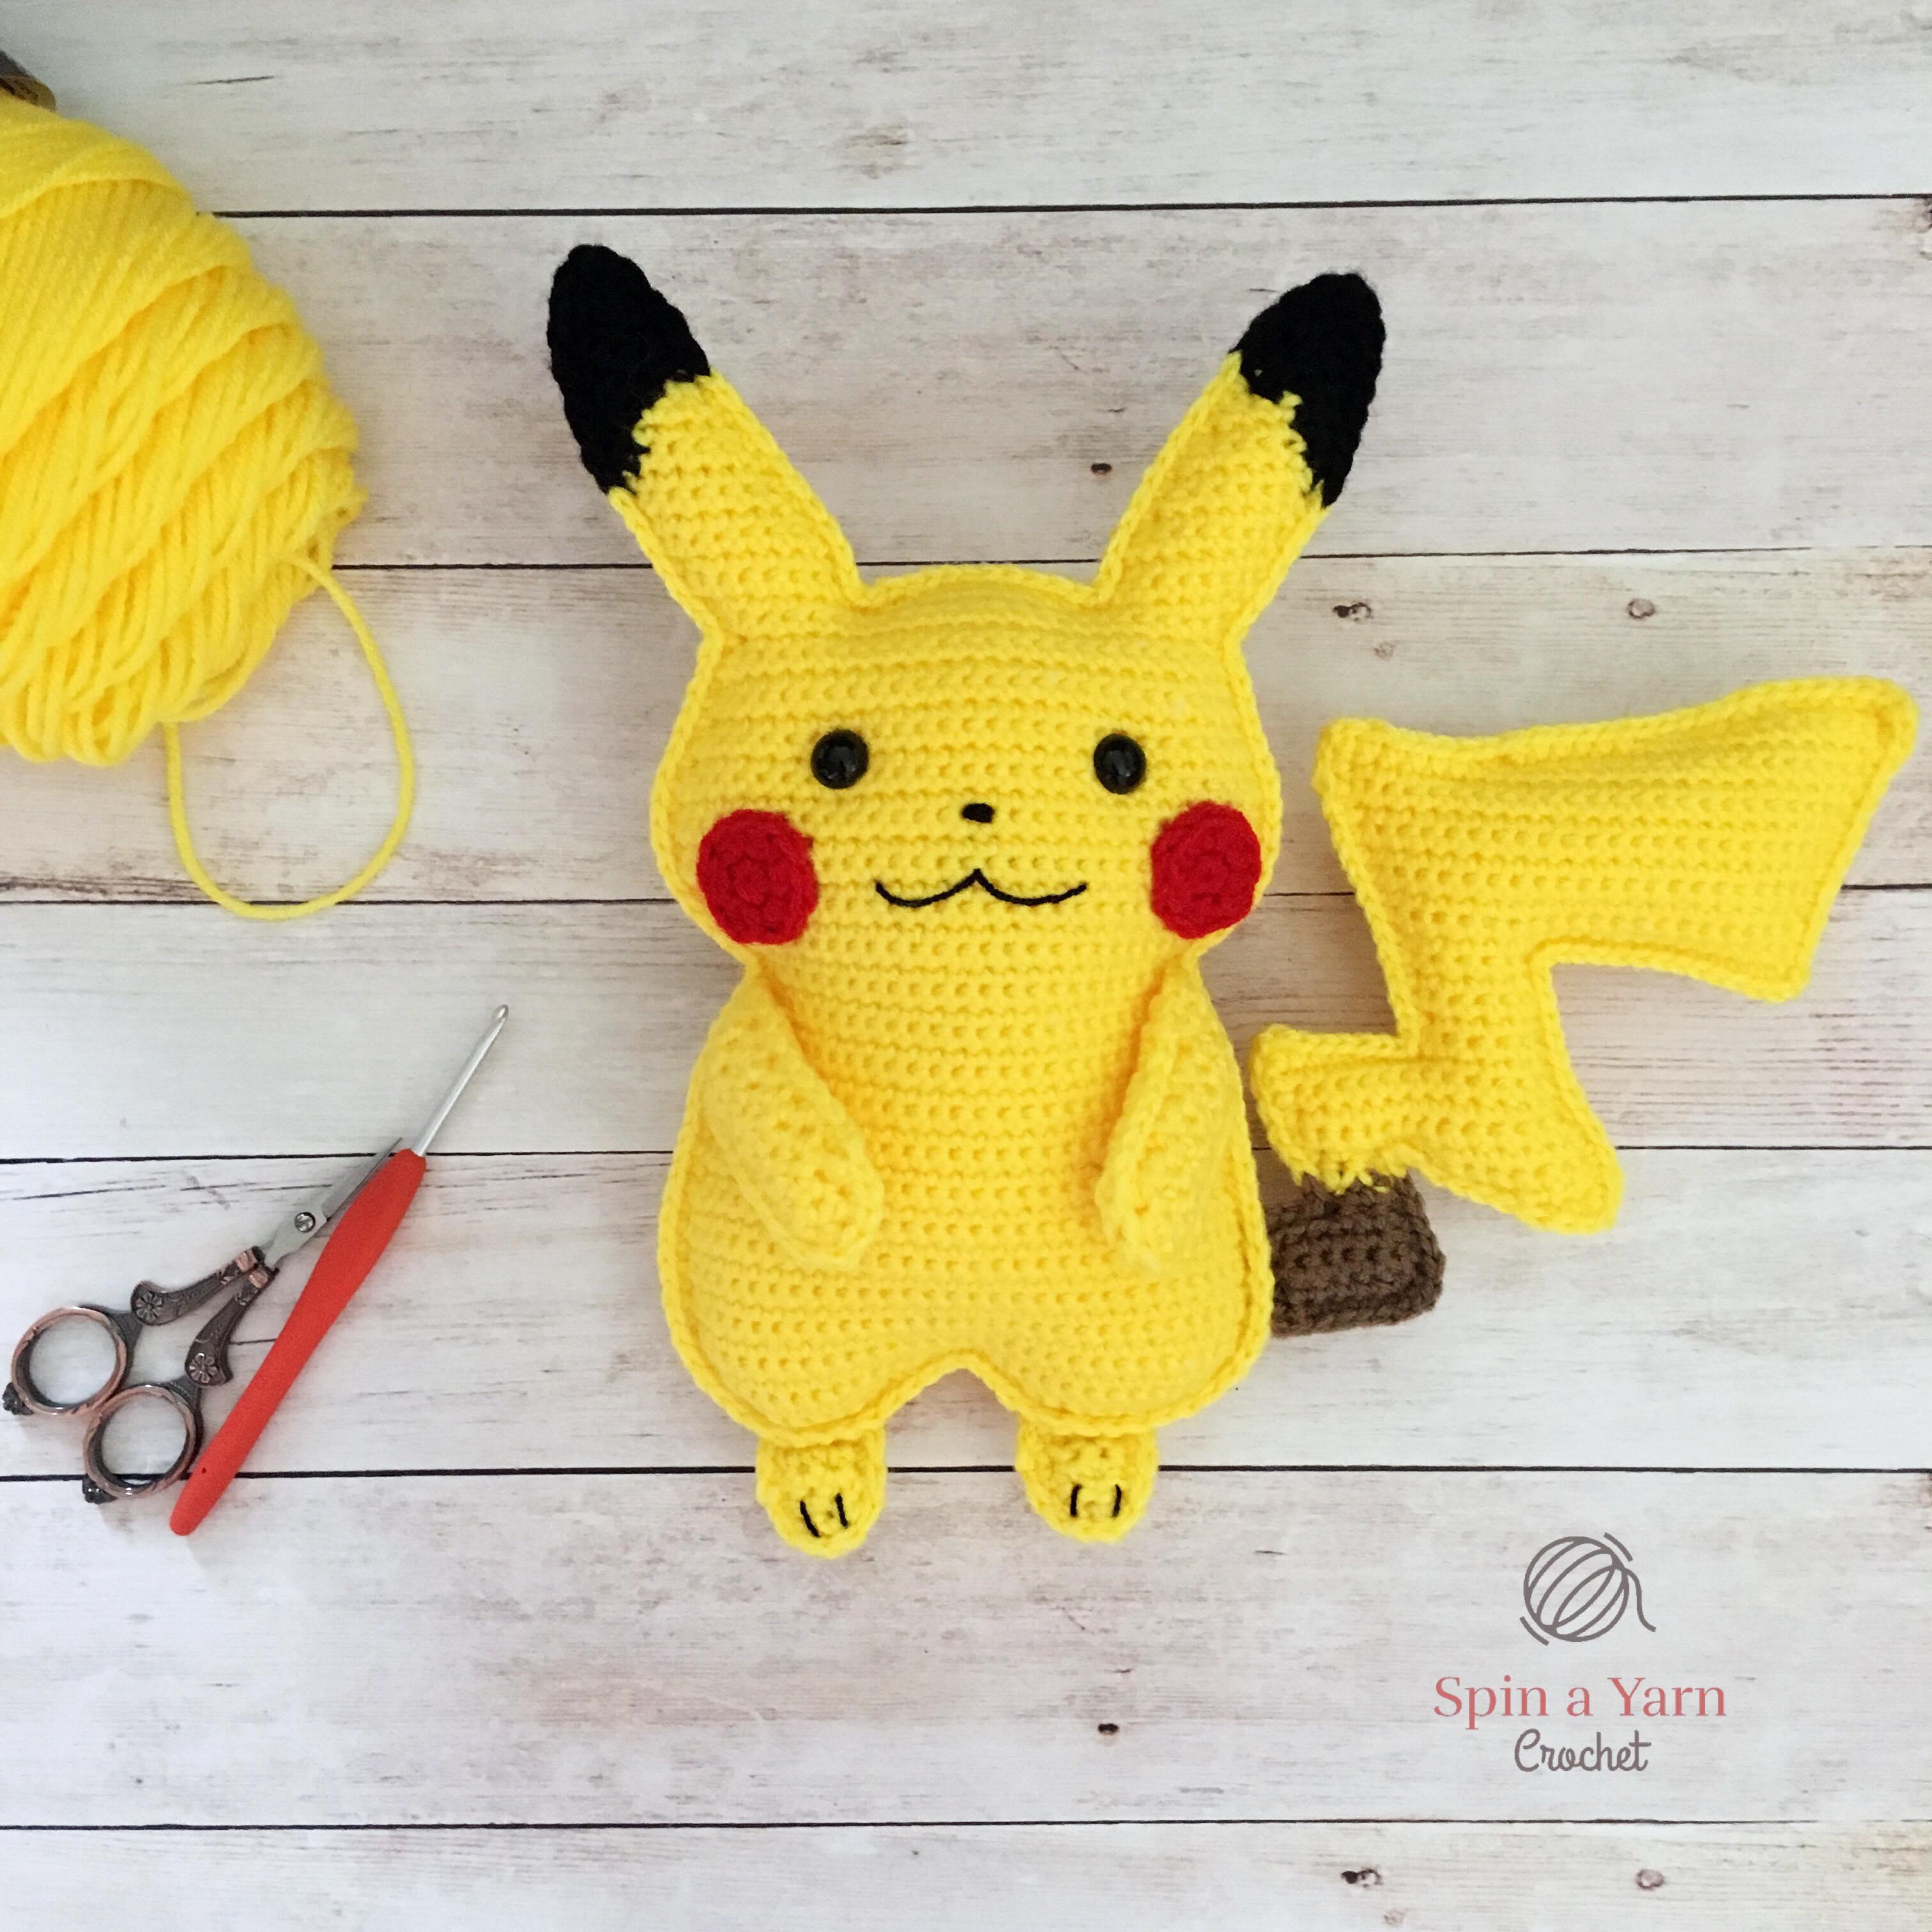 Crochet Patterns Archives • Spin a Yarn Crochet